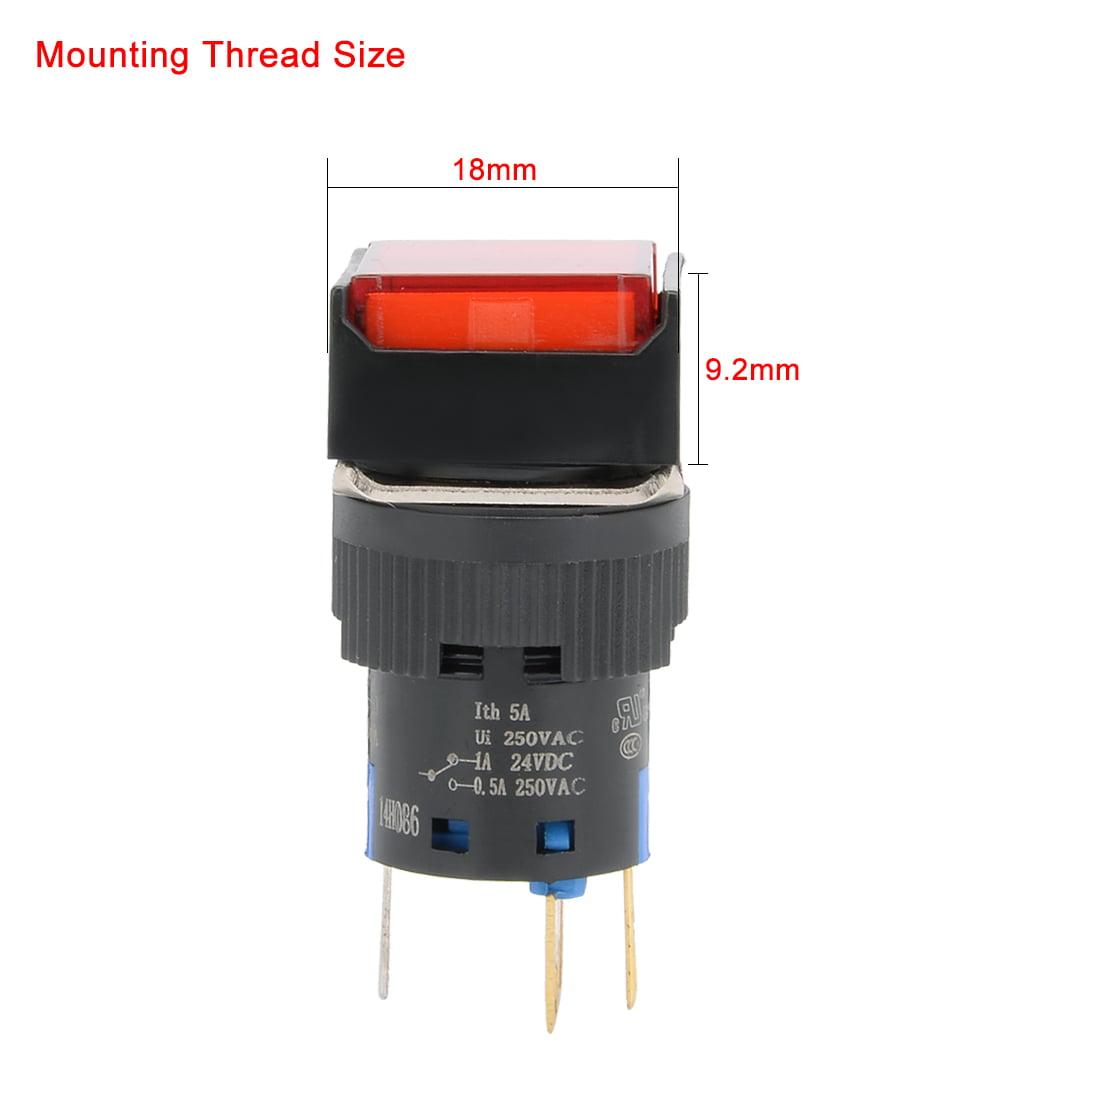 Unique Bargains 3pcs Ac 250v 5a Spdt Latching Pushbutton Switch Red Cool Electronics Circuits A Push Button Qty